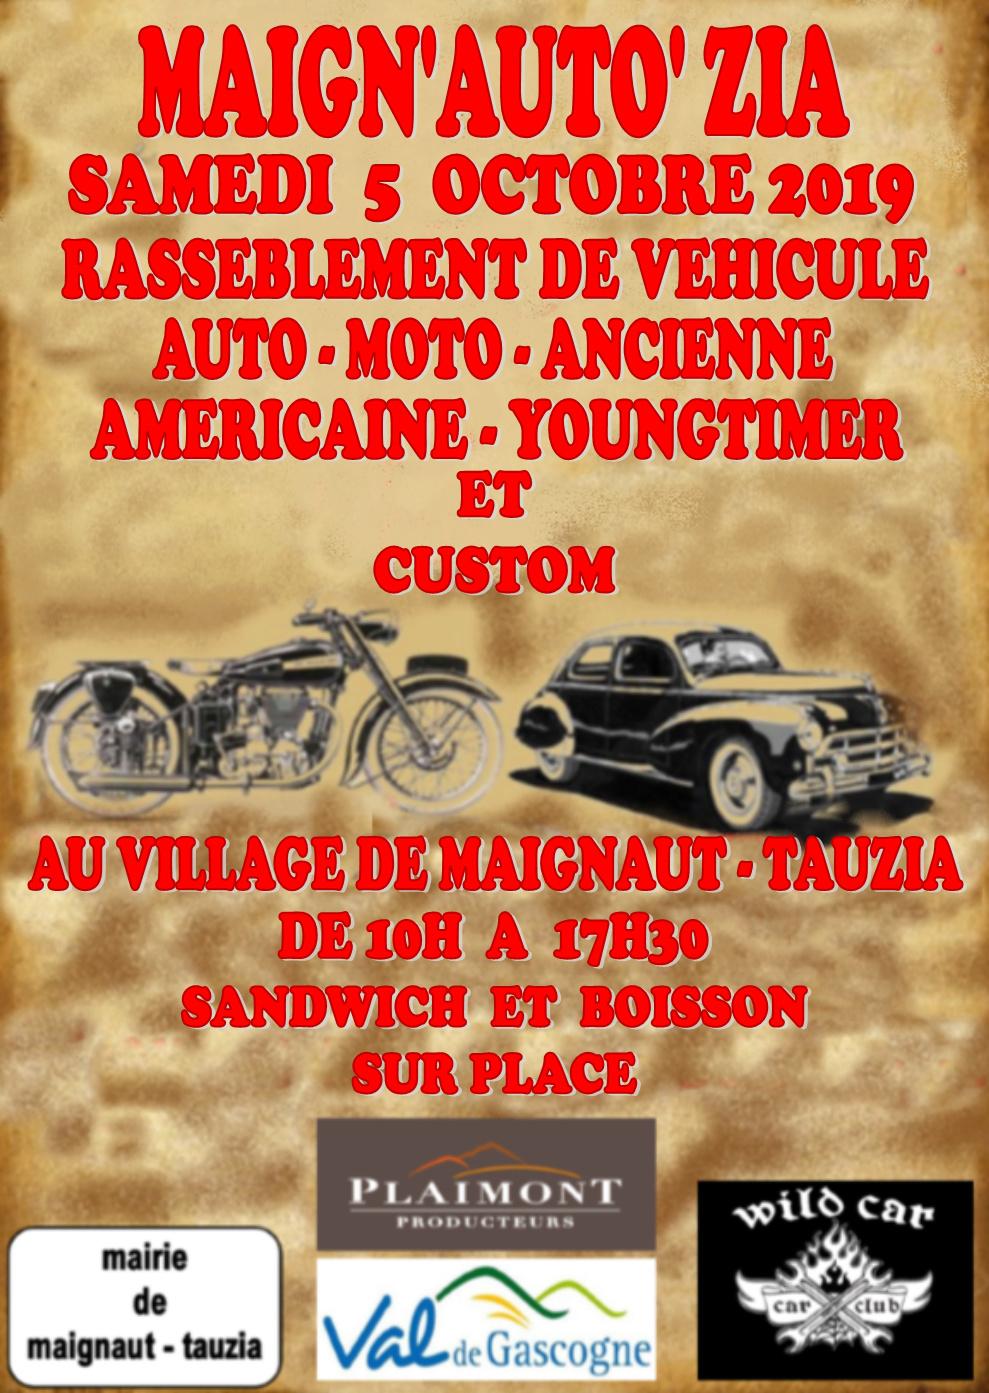 MANIFESTATION - Rassemblement - Samedi 5 Octobre 2019 - Maignaut-Tauzia  2019af12